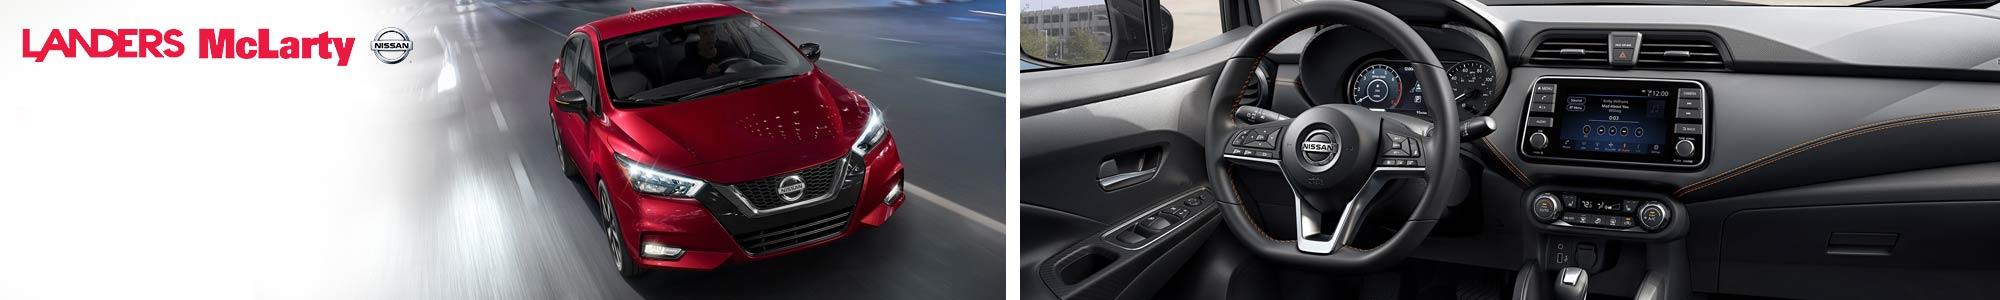 2020 Nissan Versa Interior and Exterior